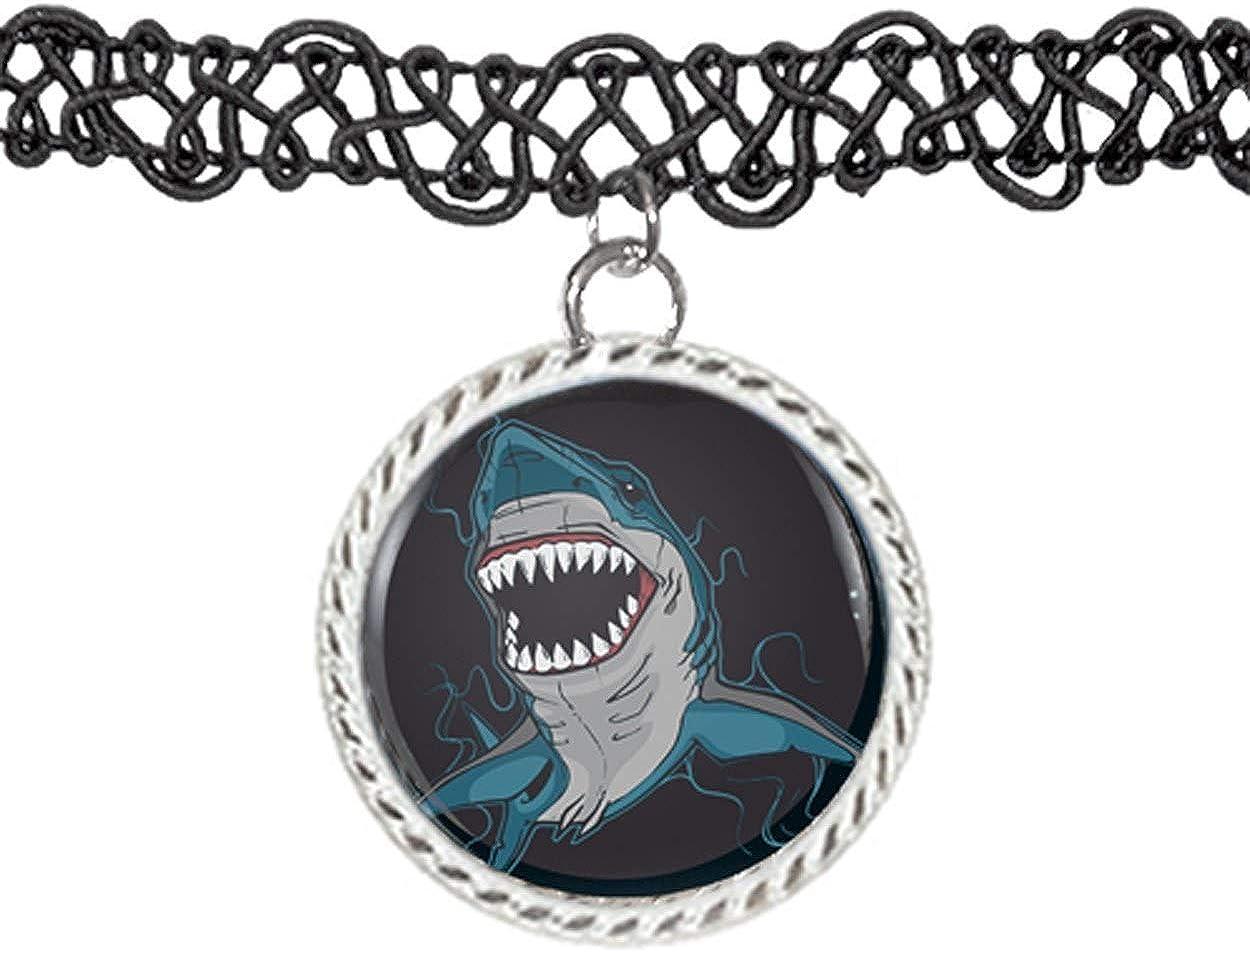 Arthwick Store Illustration of a Shark with Sharp Teeth Choker Pendant Charm Necklace